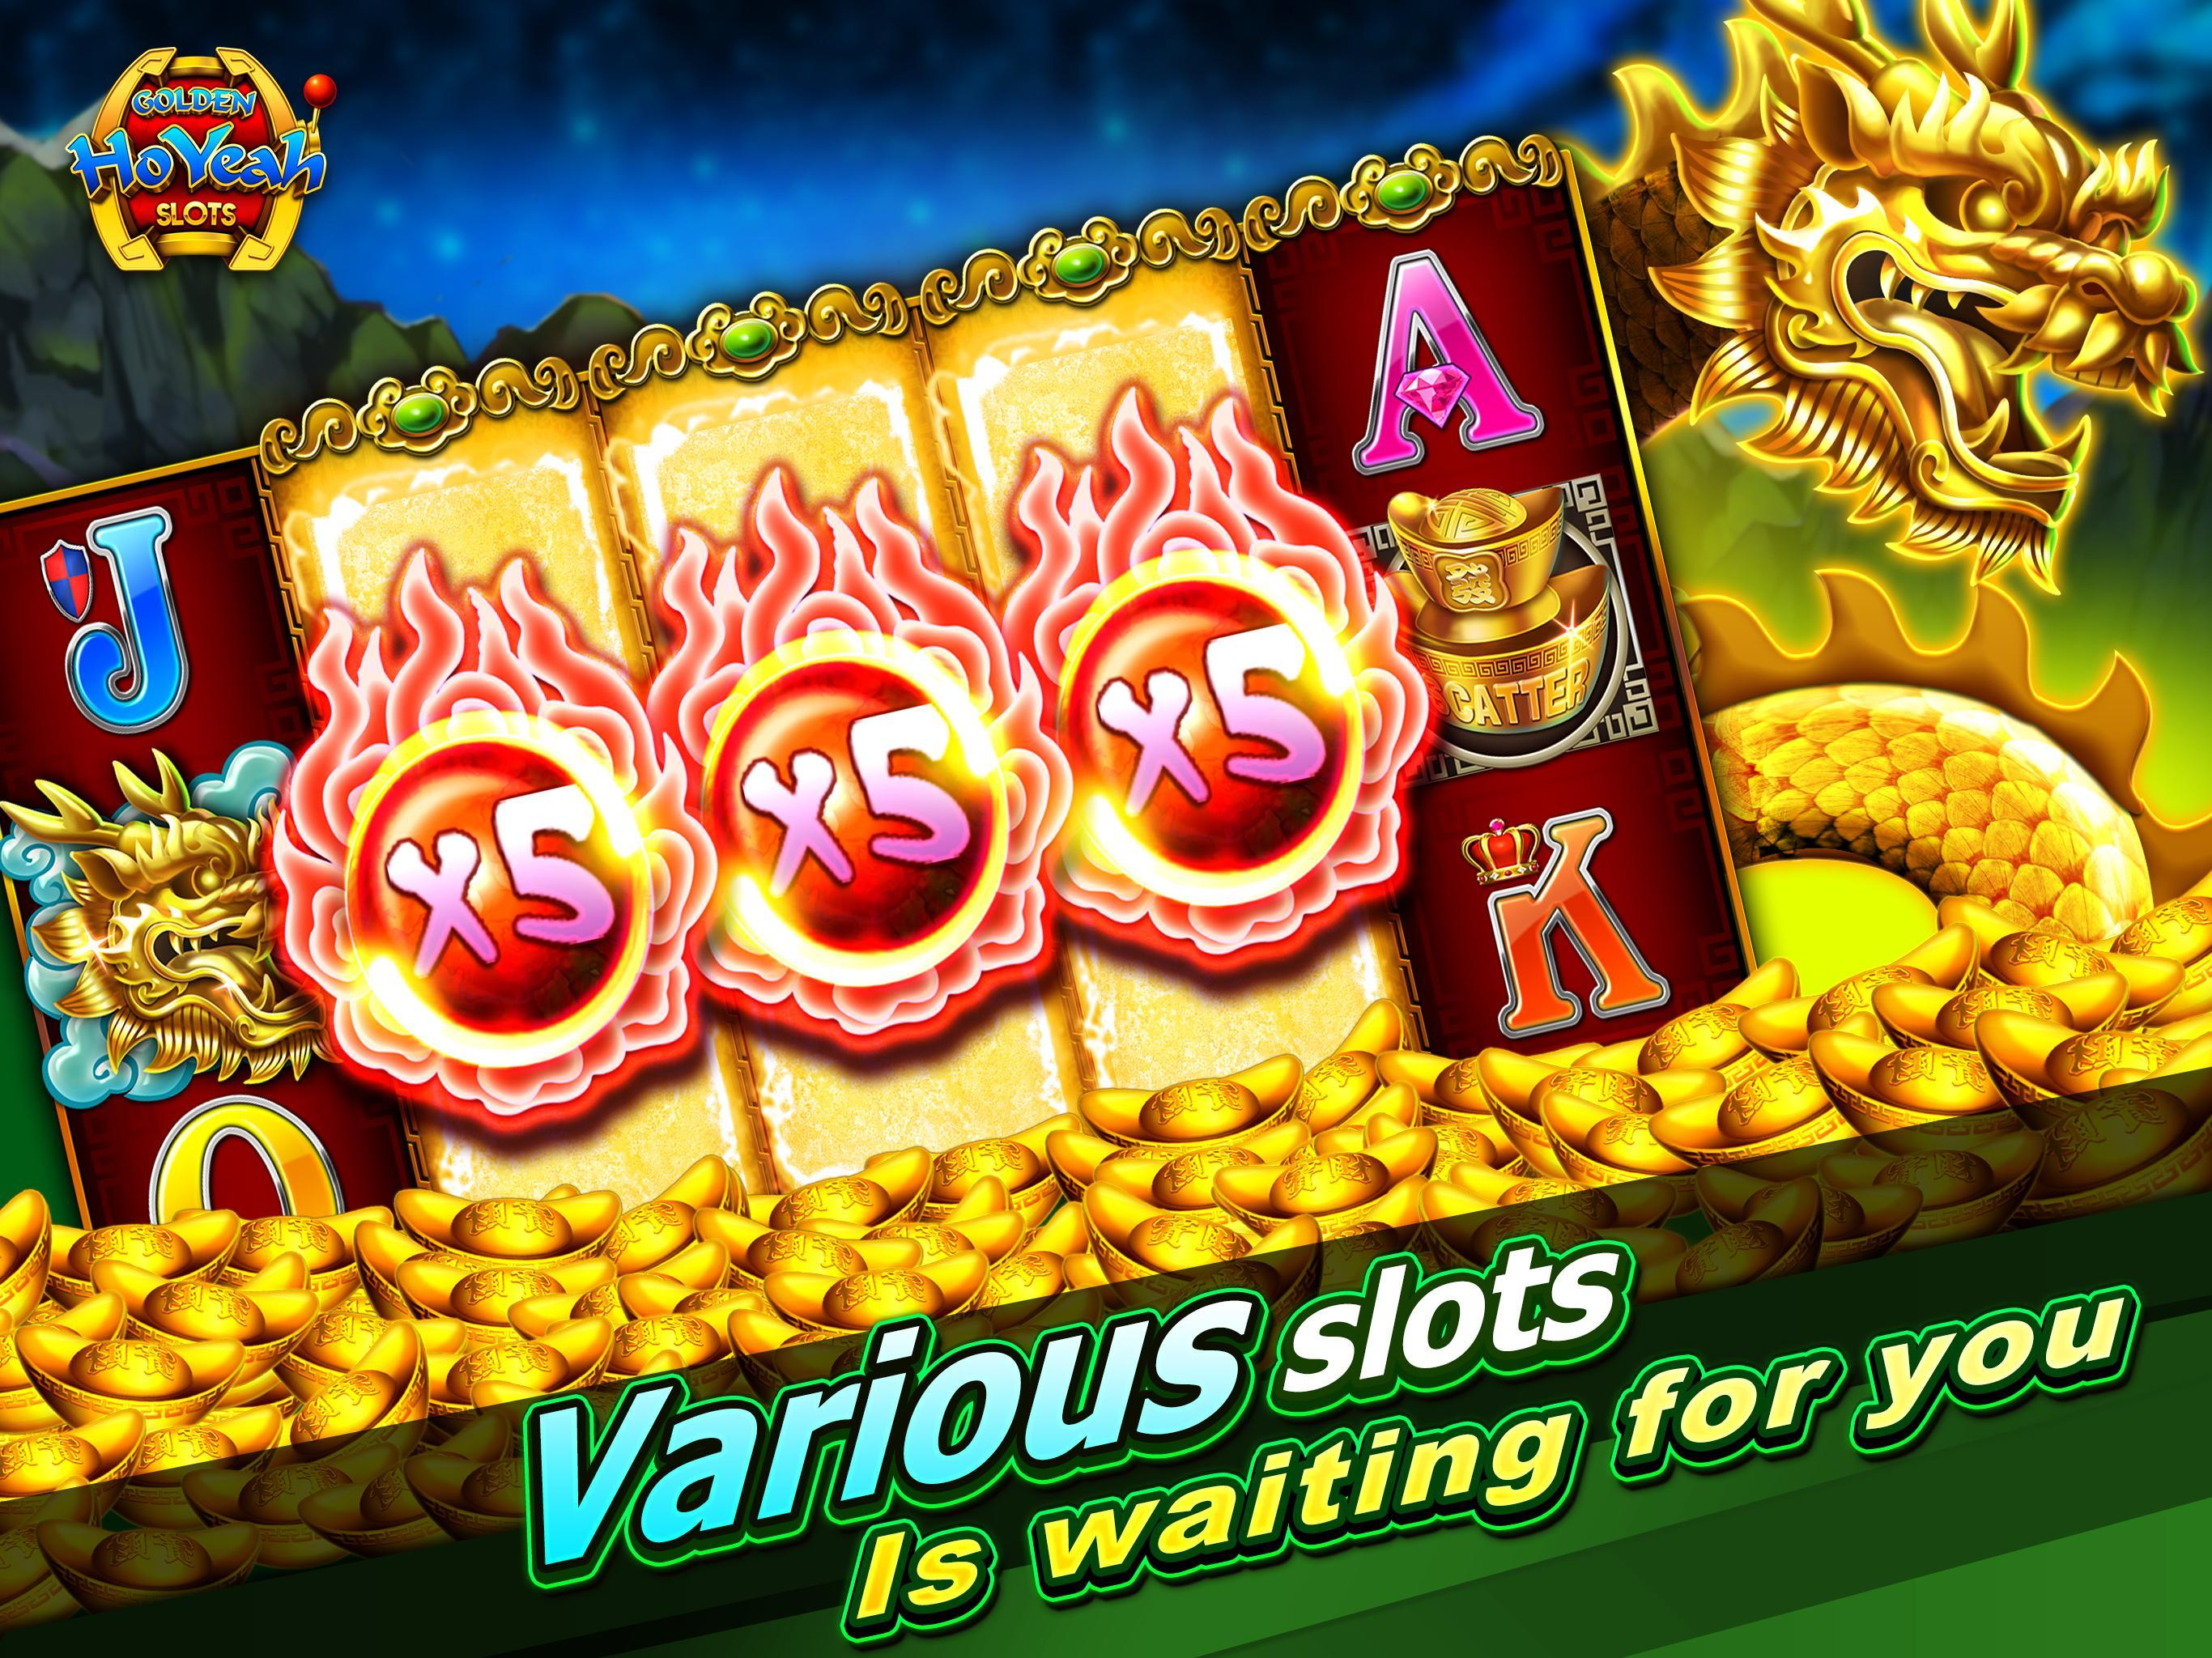 Slots (Golden HoYeah) - Casino Slots 2.5.7 Screenshot 11